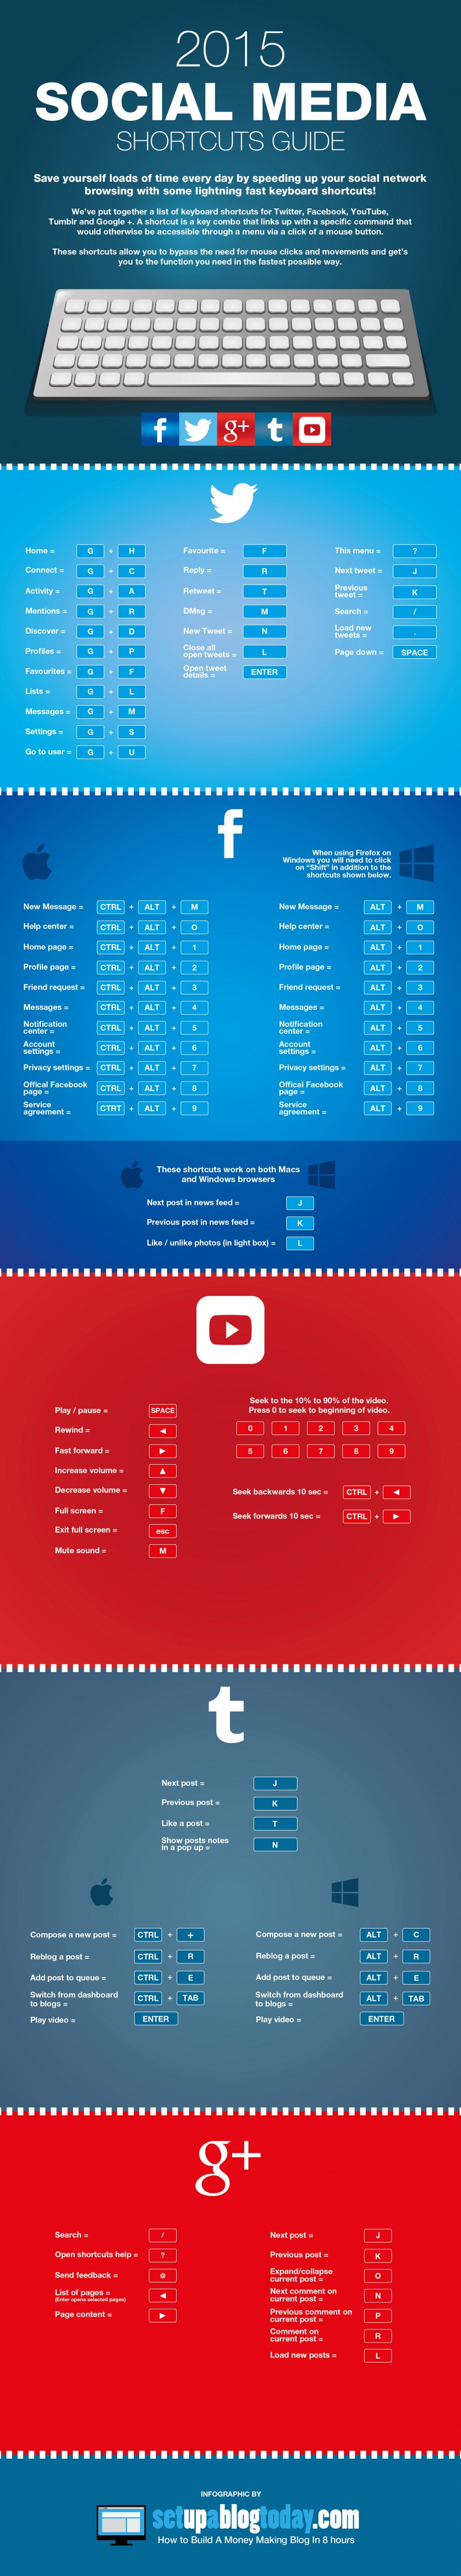 Social-Media-Shortcut-Guide: So bewegst du dich schneller durch Facebook und Co. (Infografik: Setupablogtoday.com)